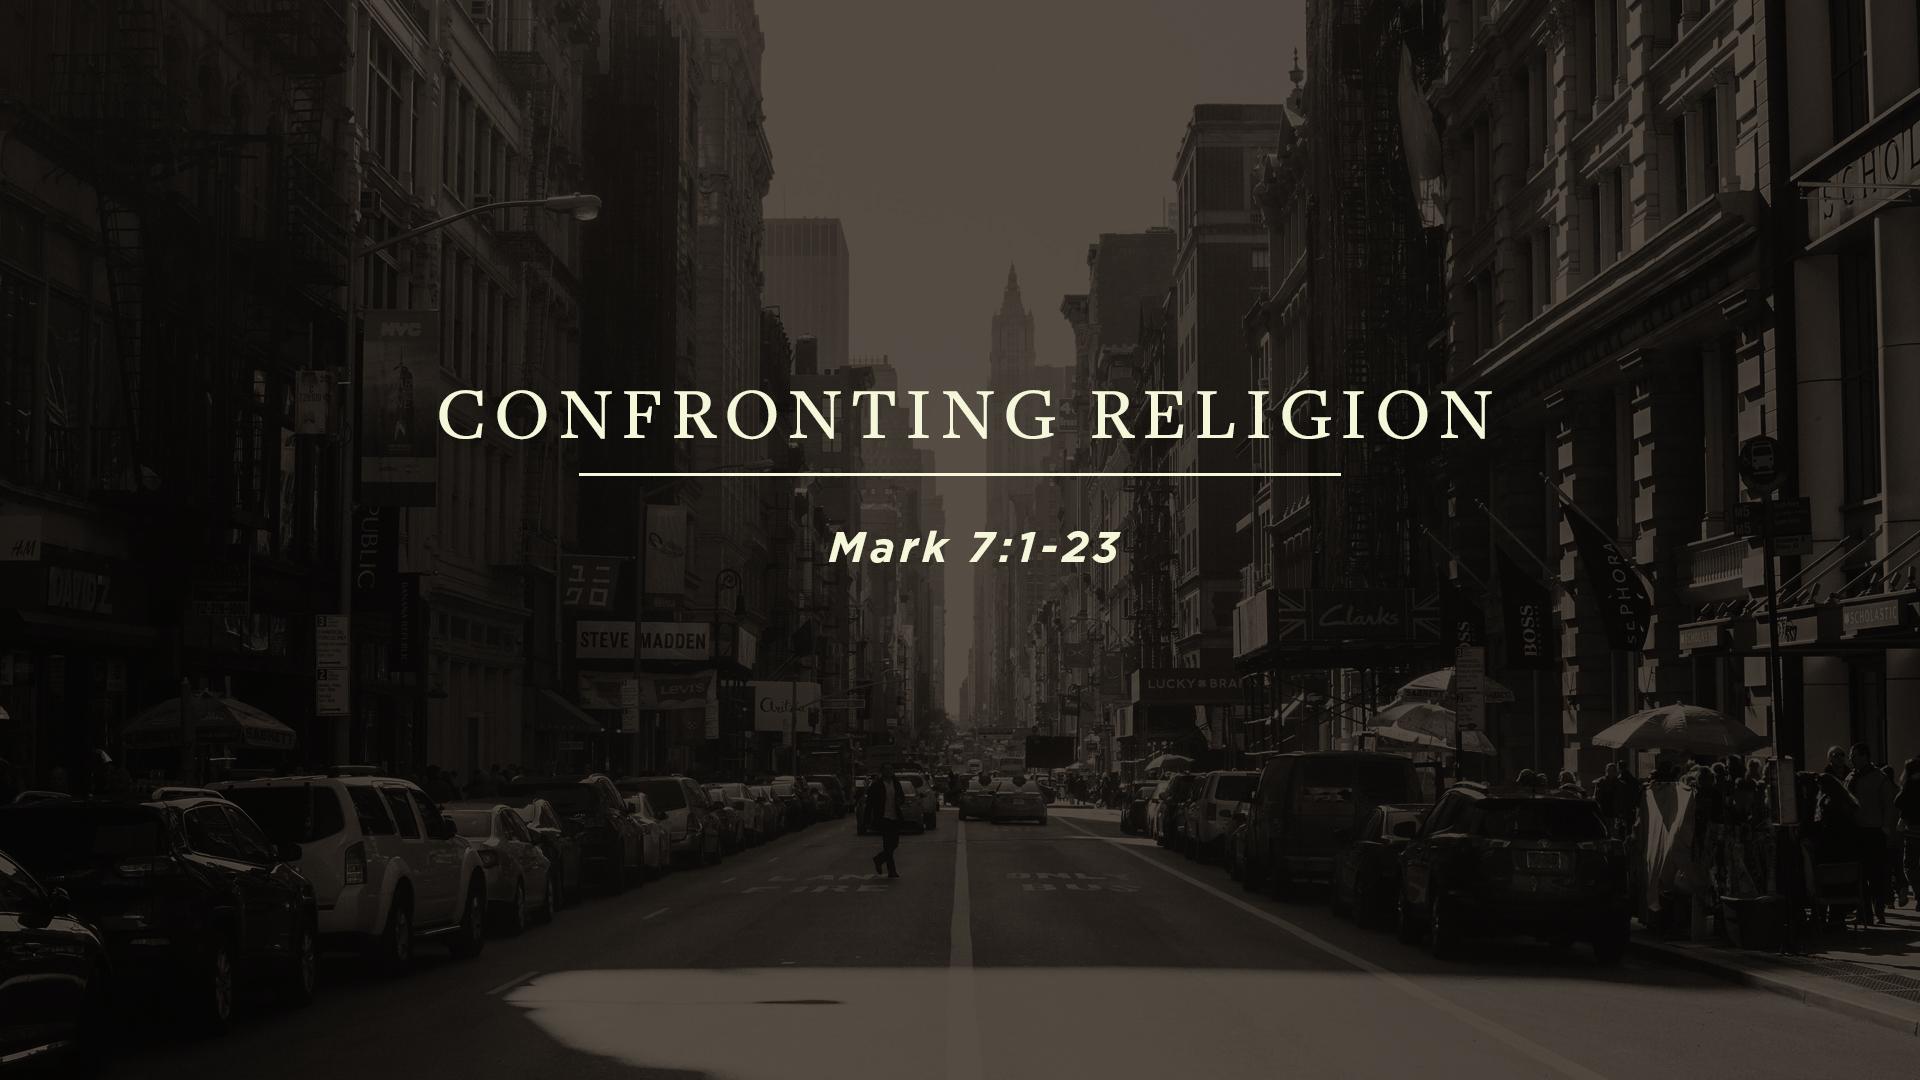 Confronting Religion